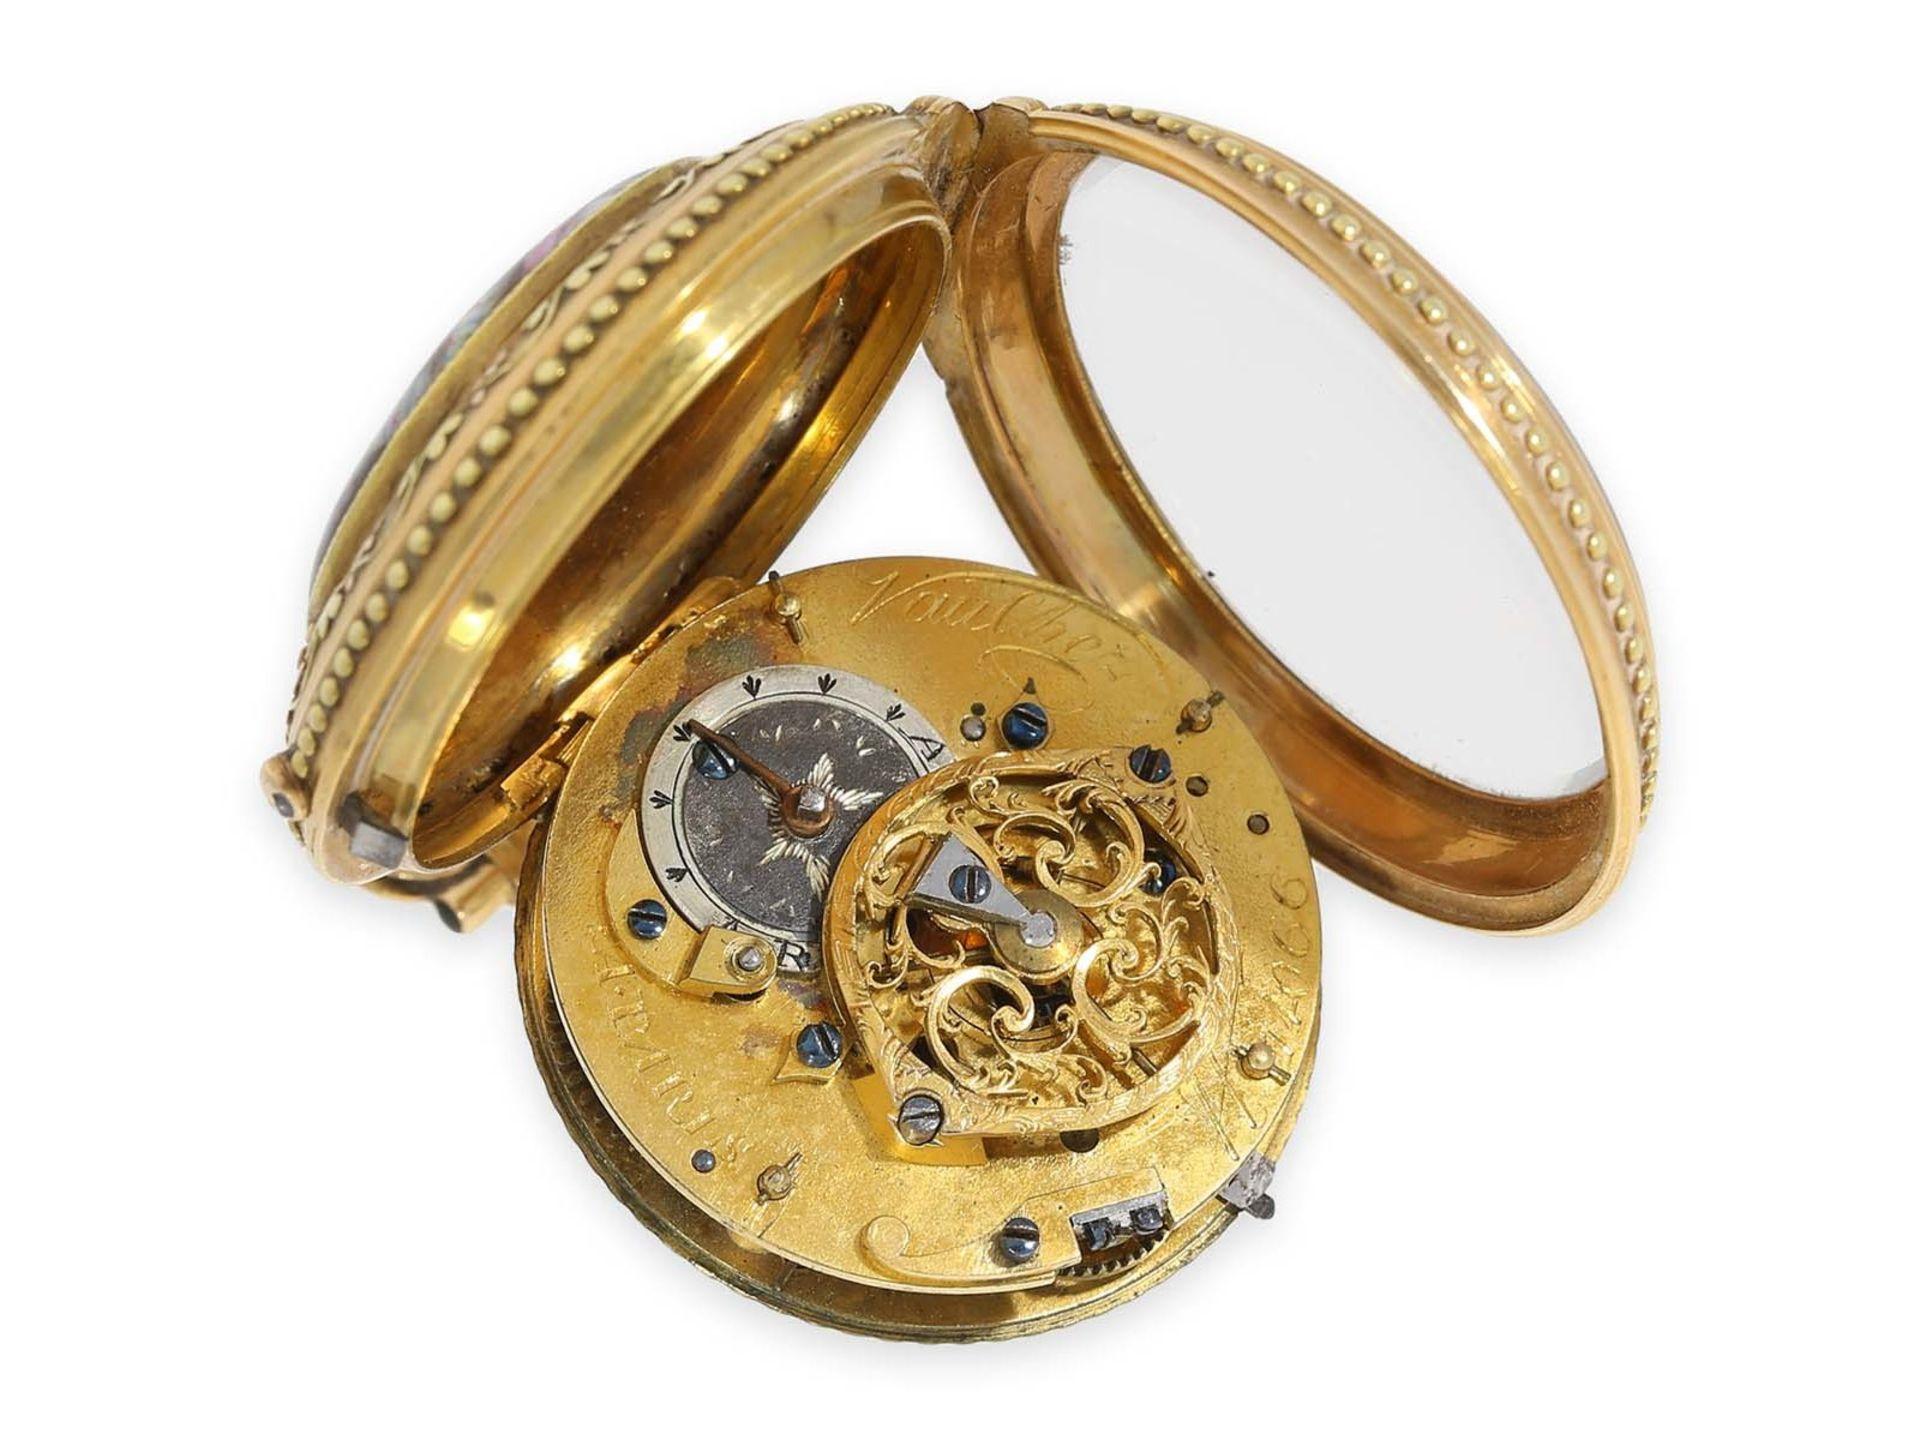 Pocket watch: gold/ enamel verge watch with finest enamel painting, excellent quality, Vaucher Paris - Bild 3 aus 3